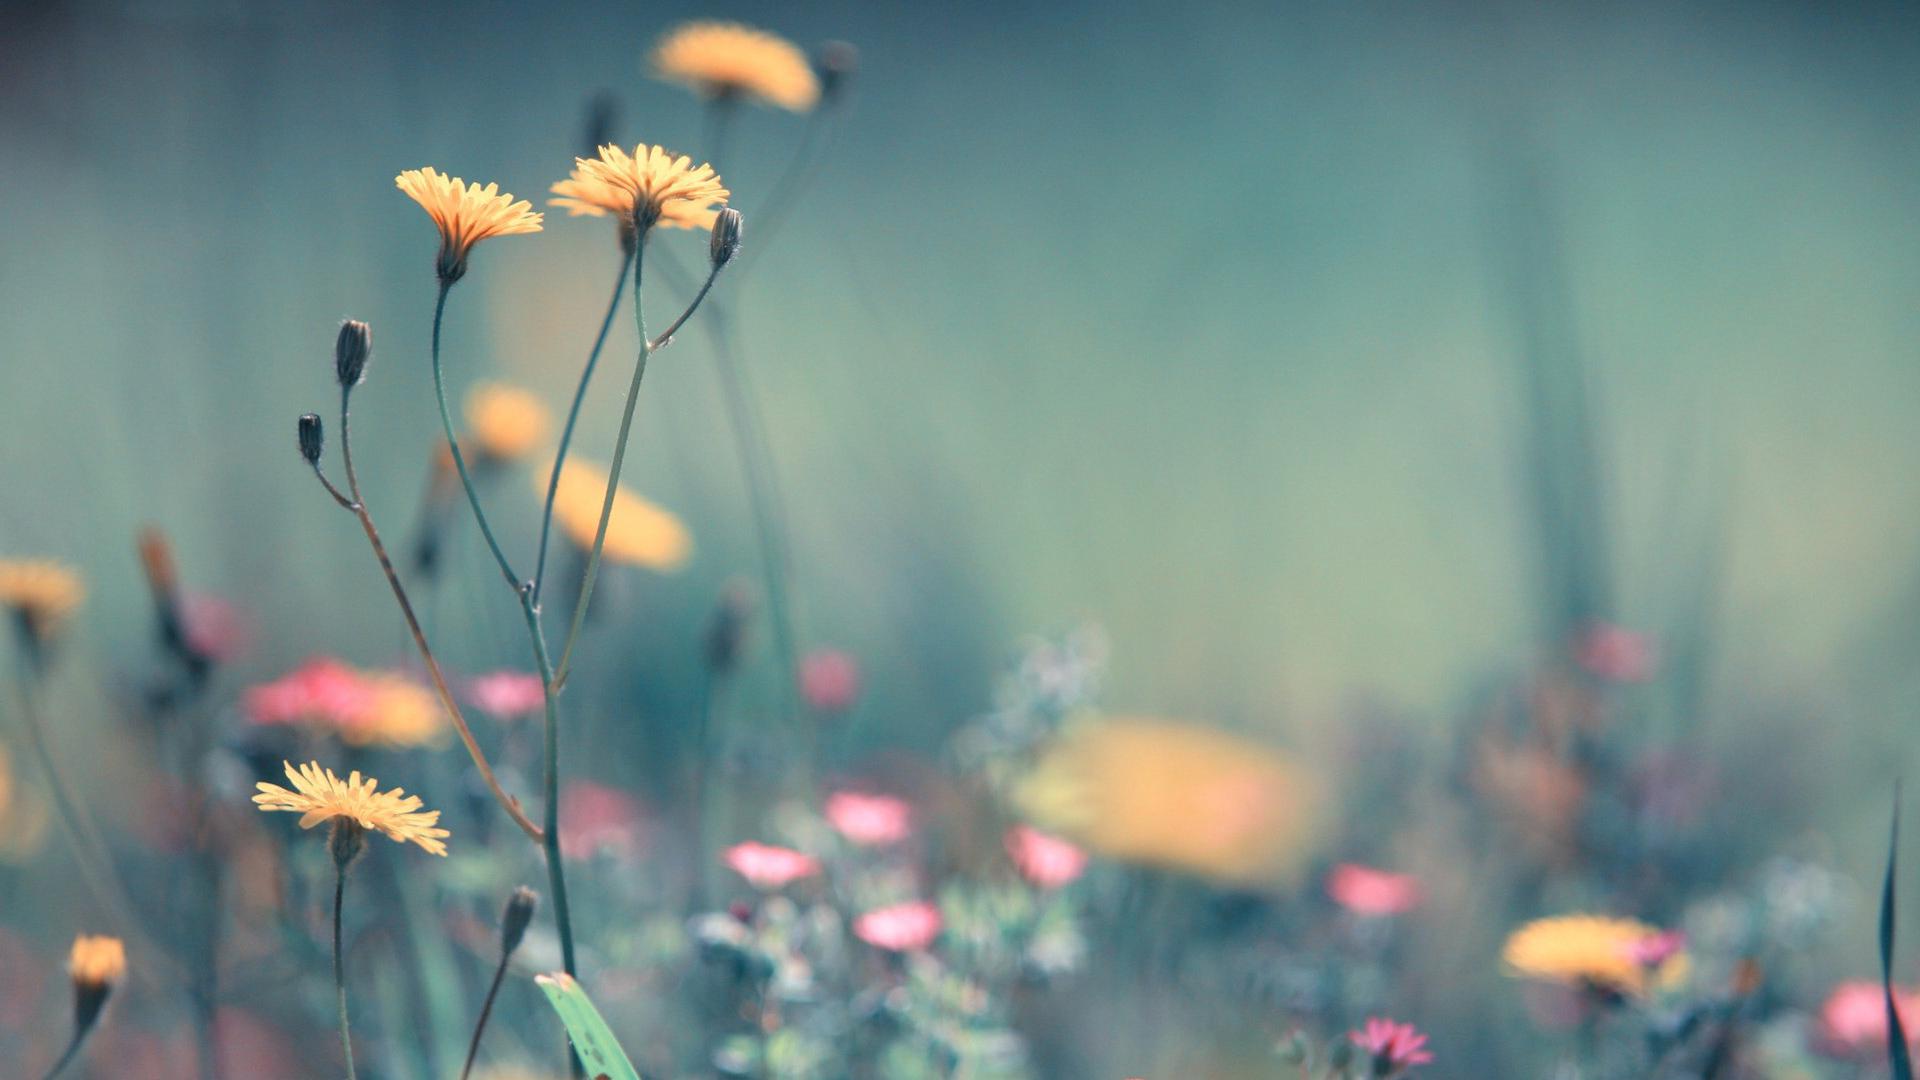 More Beautiful Beautiful Spring Flowers Wallpaper FLgrx Graphics 1920x1080